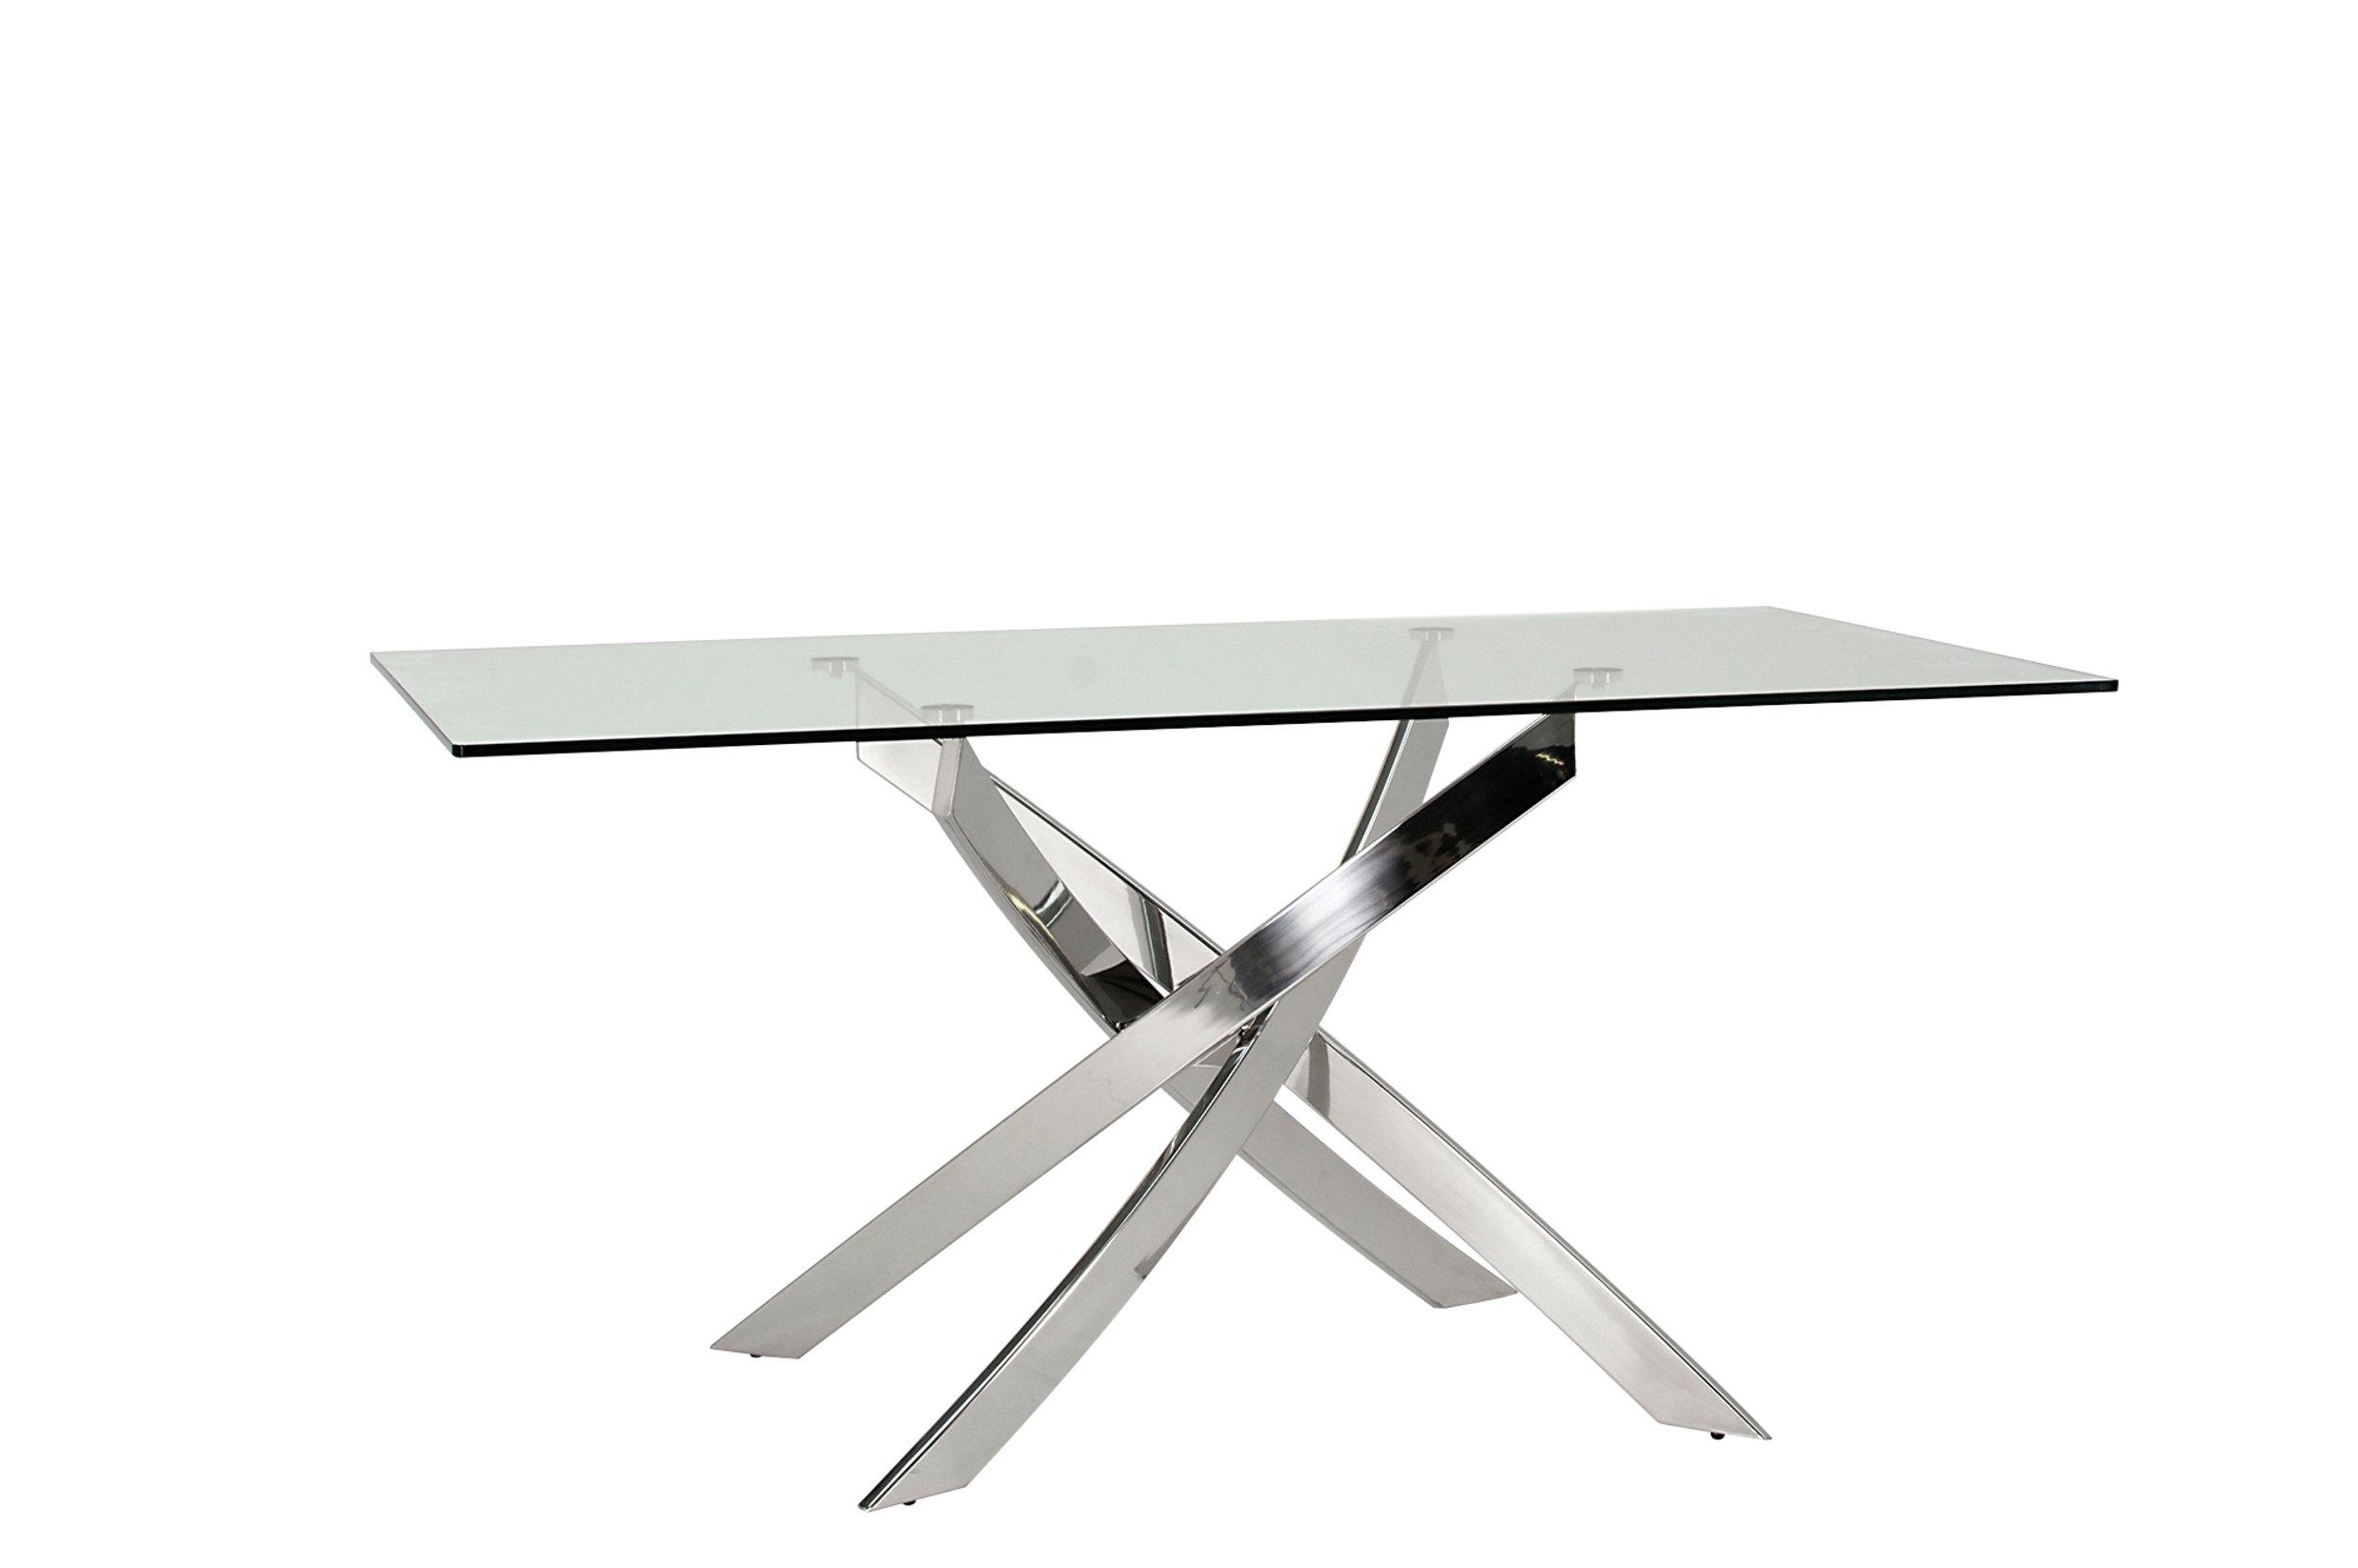 Image of Furnoko Kalmar Glass 4 Seater Table - Clear